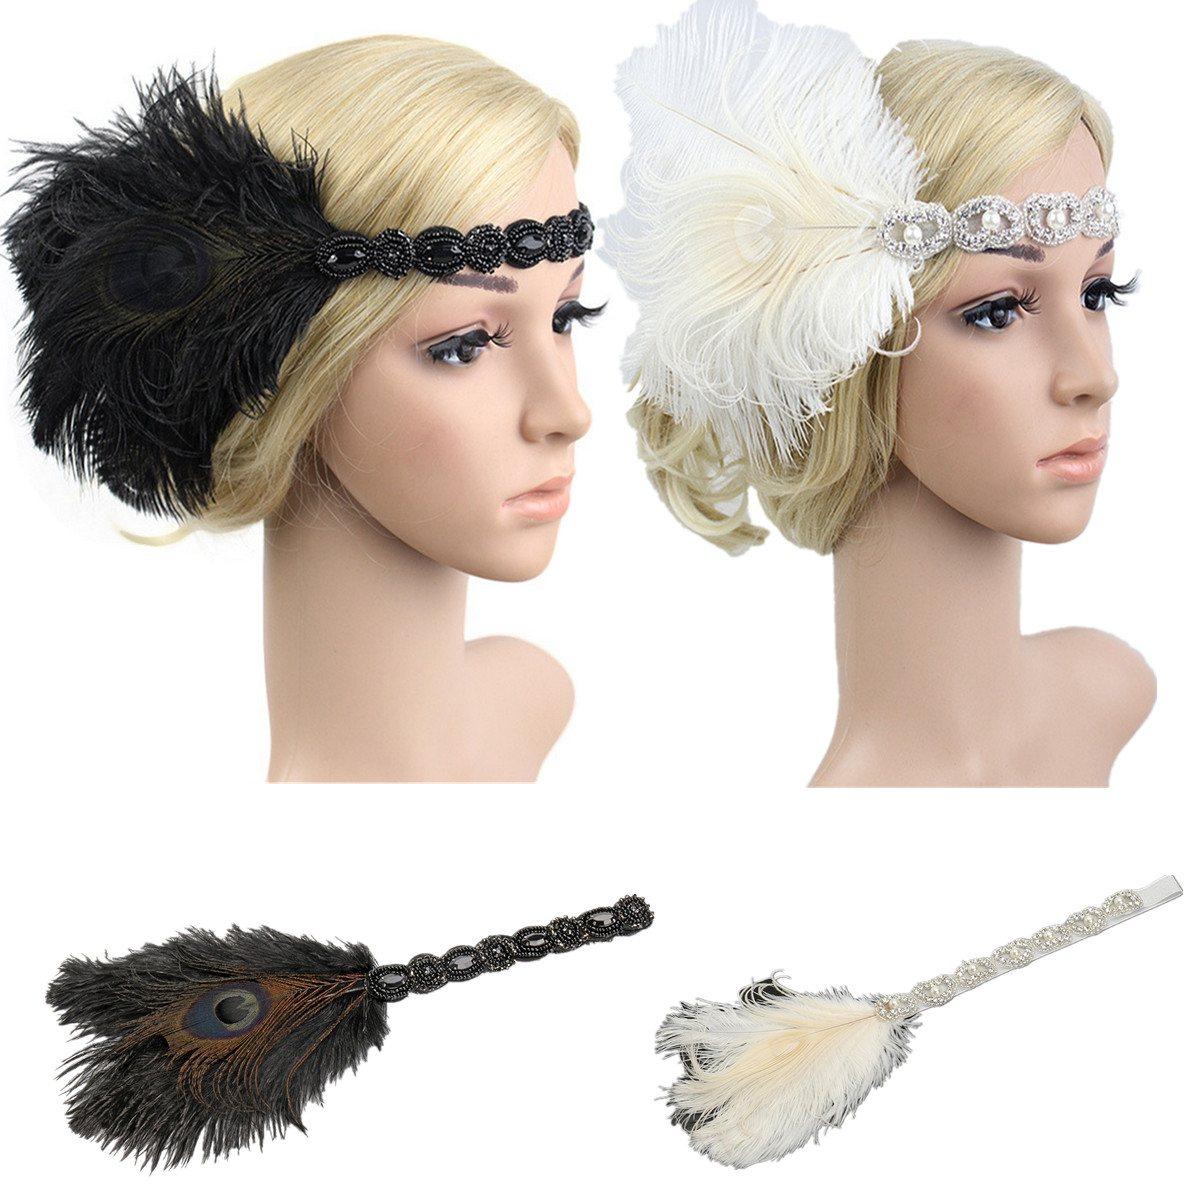 Peacock Feather Headband Retro 1920s Vintage Gatsby Party Flapper Headpiece  Women Rhinestone Beaded Hair Accessories Headwear 1591cf583d4